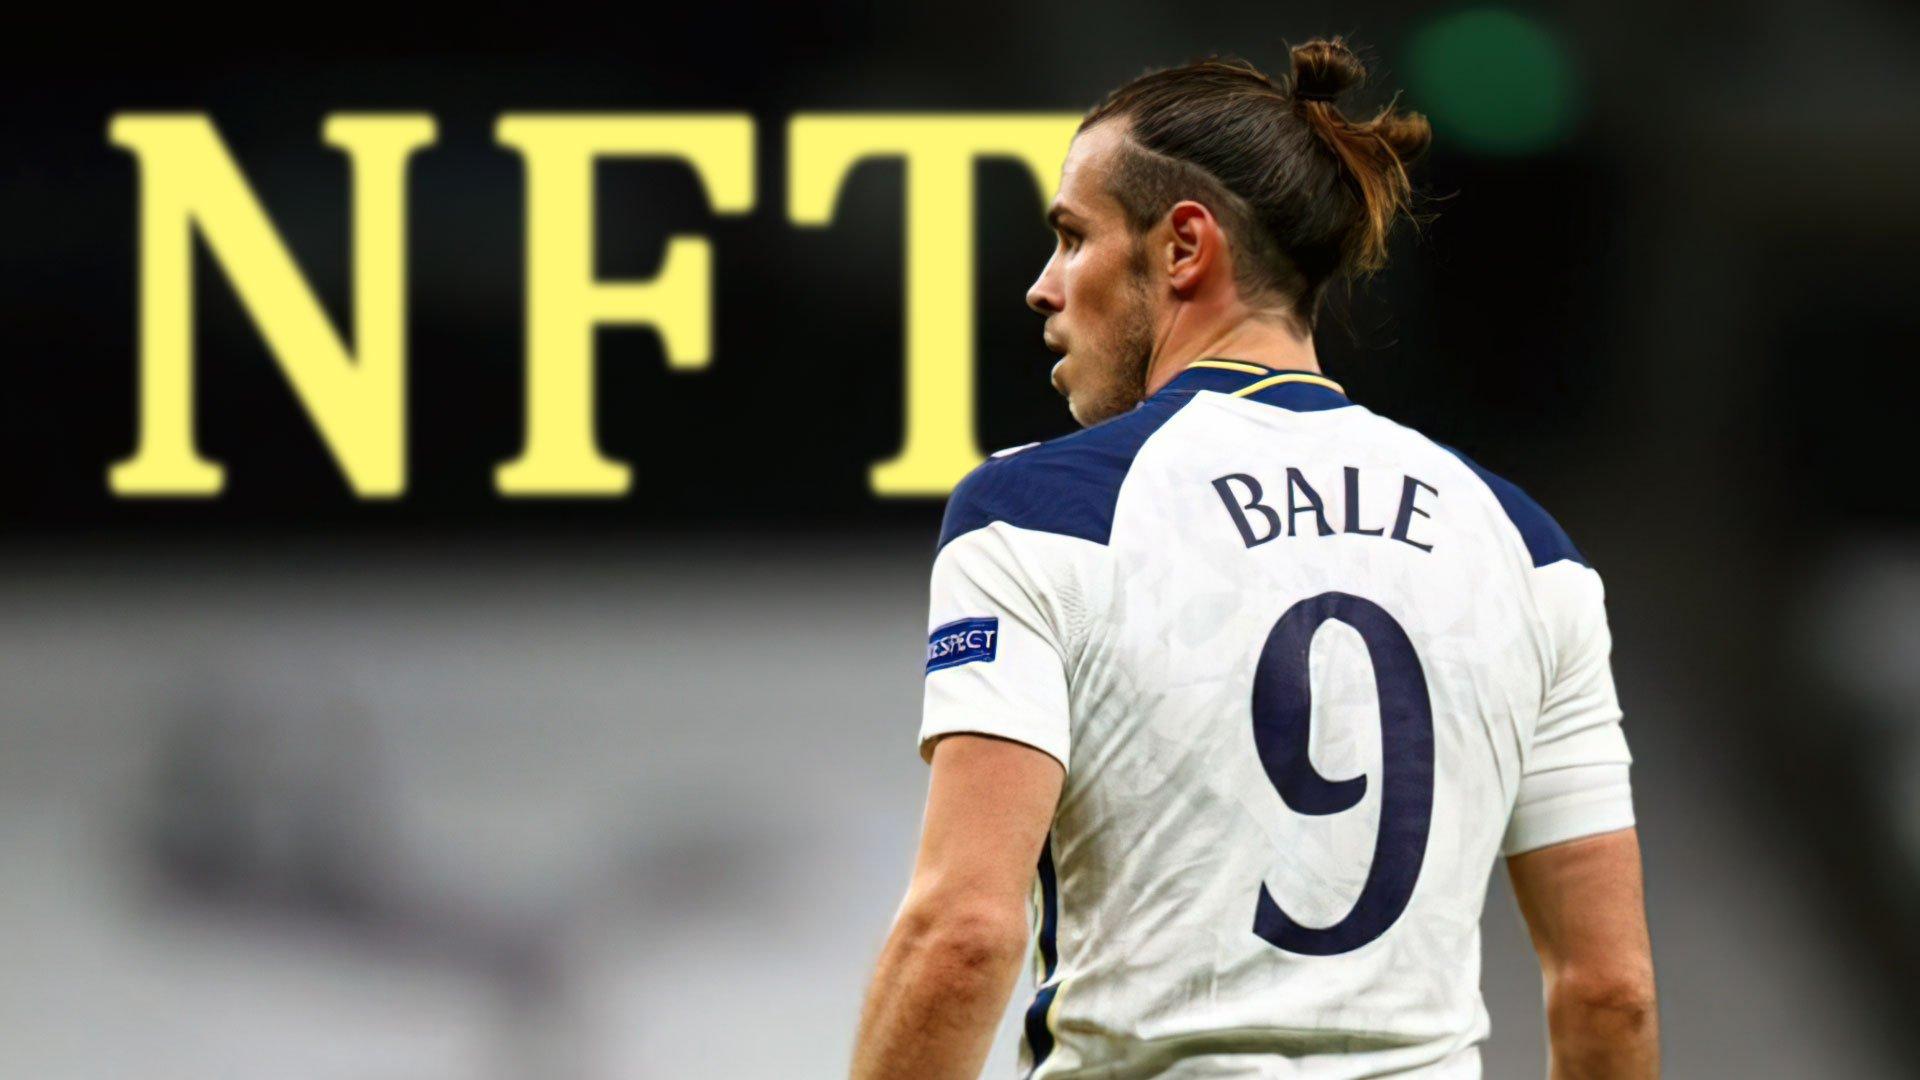 Gareth Bale NFT